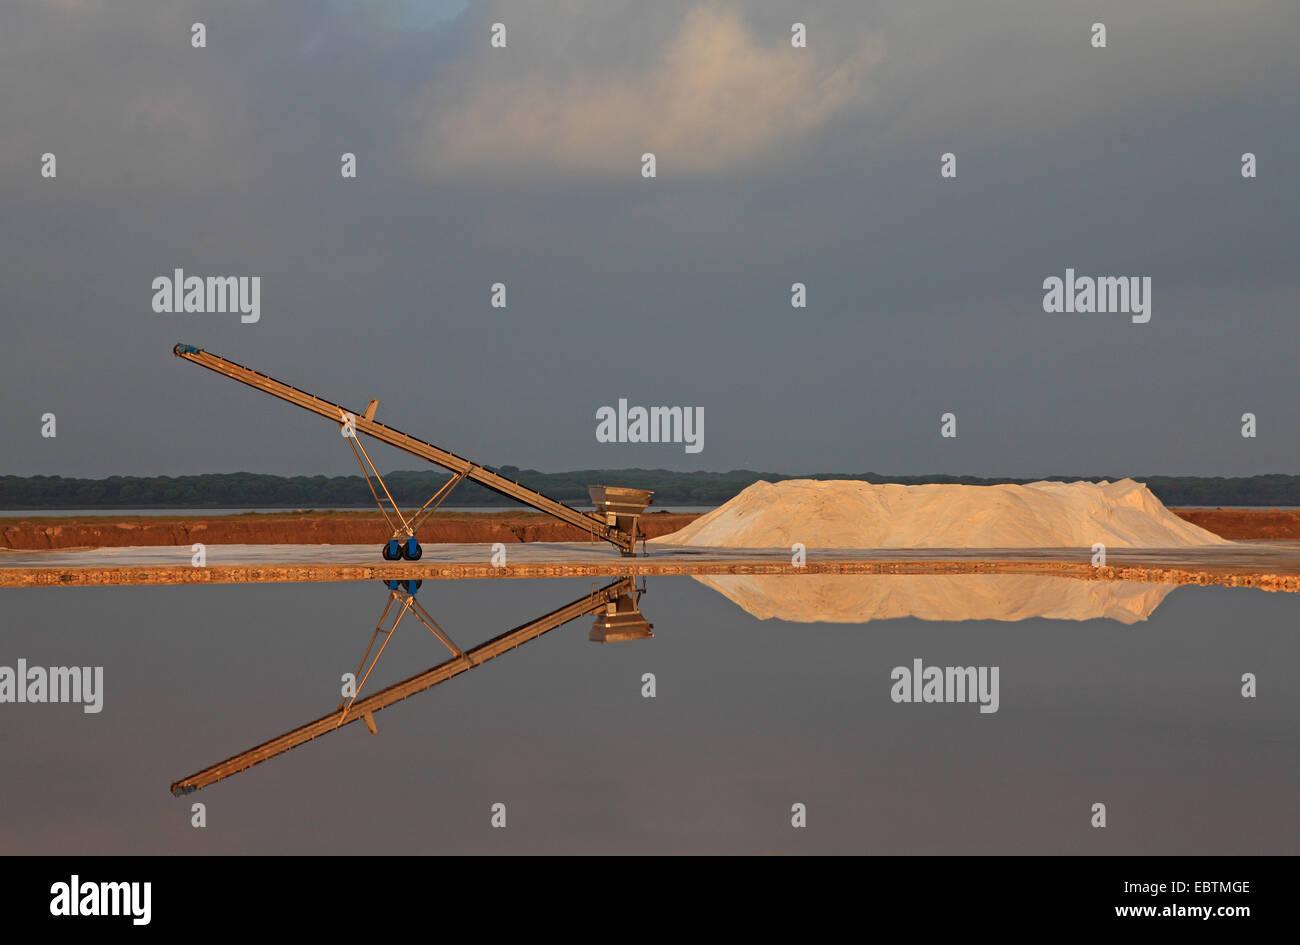 belt conveyor of a saline, salt production, Spain, Sanlucar de Barrameda - Stock Image